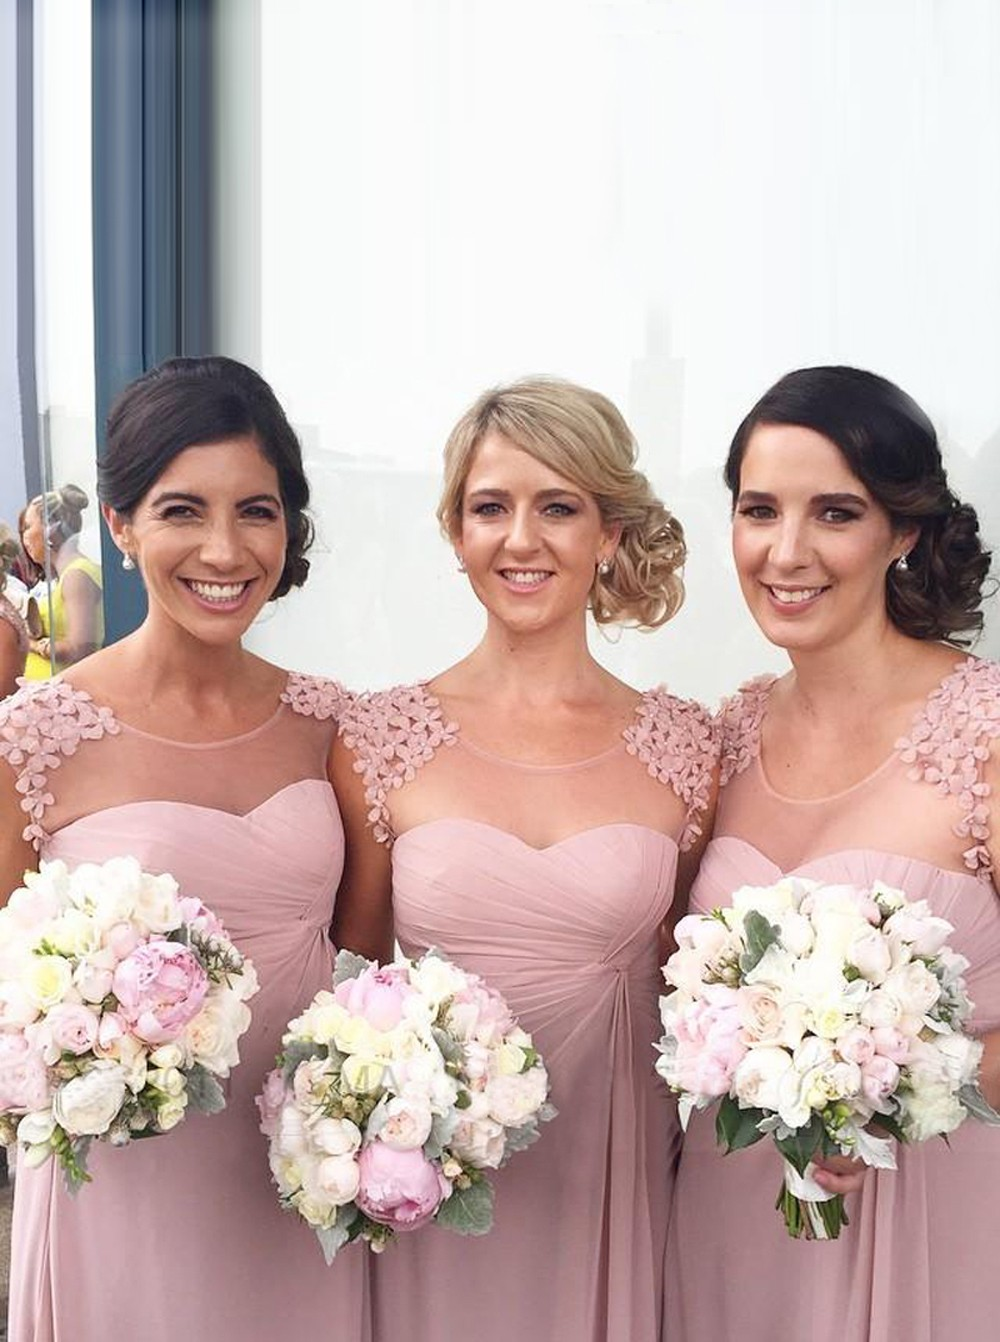 Junior Bridesmaid Dresses Plus Size Bridesmaid Dresses Unique Bridesmaid  Dresses Best Bridesmaid Dresses from simpledress